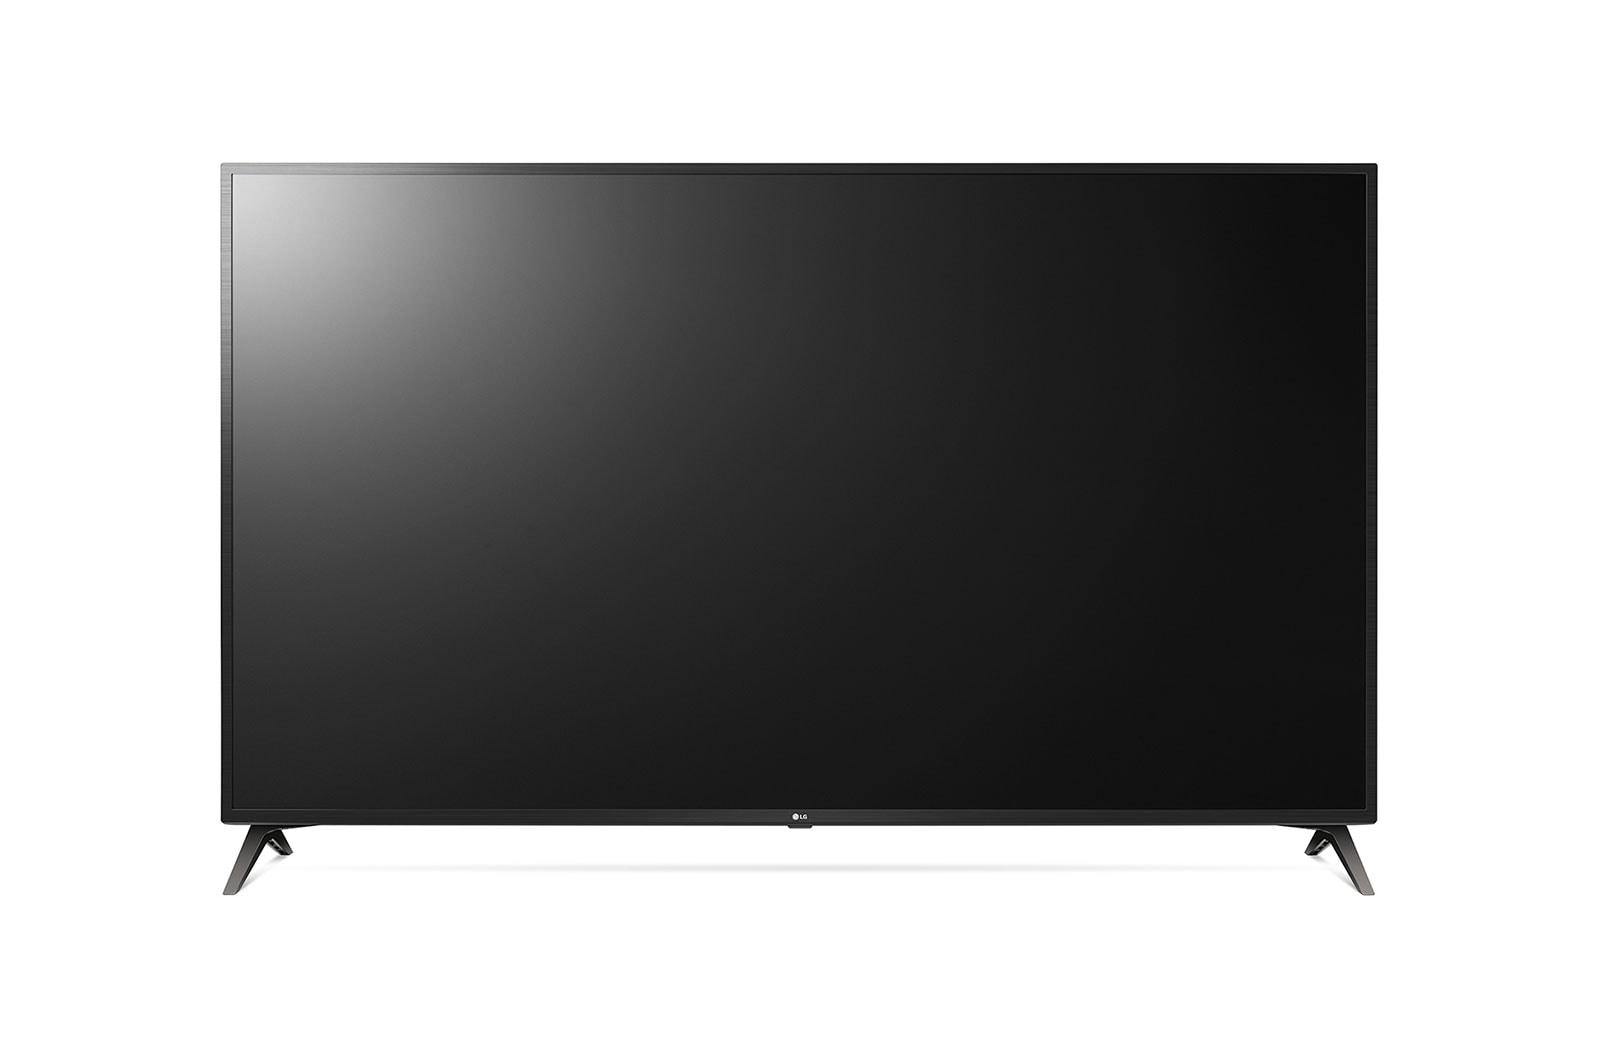 مشخصات تلویزیون ال جی 75 اینچ مدل 75UN7180PVC